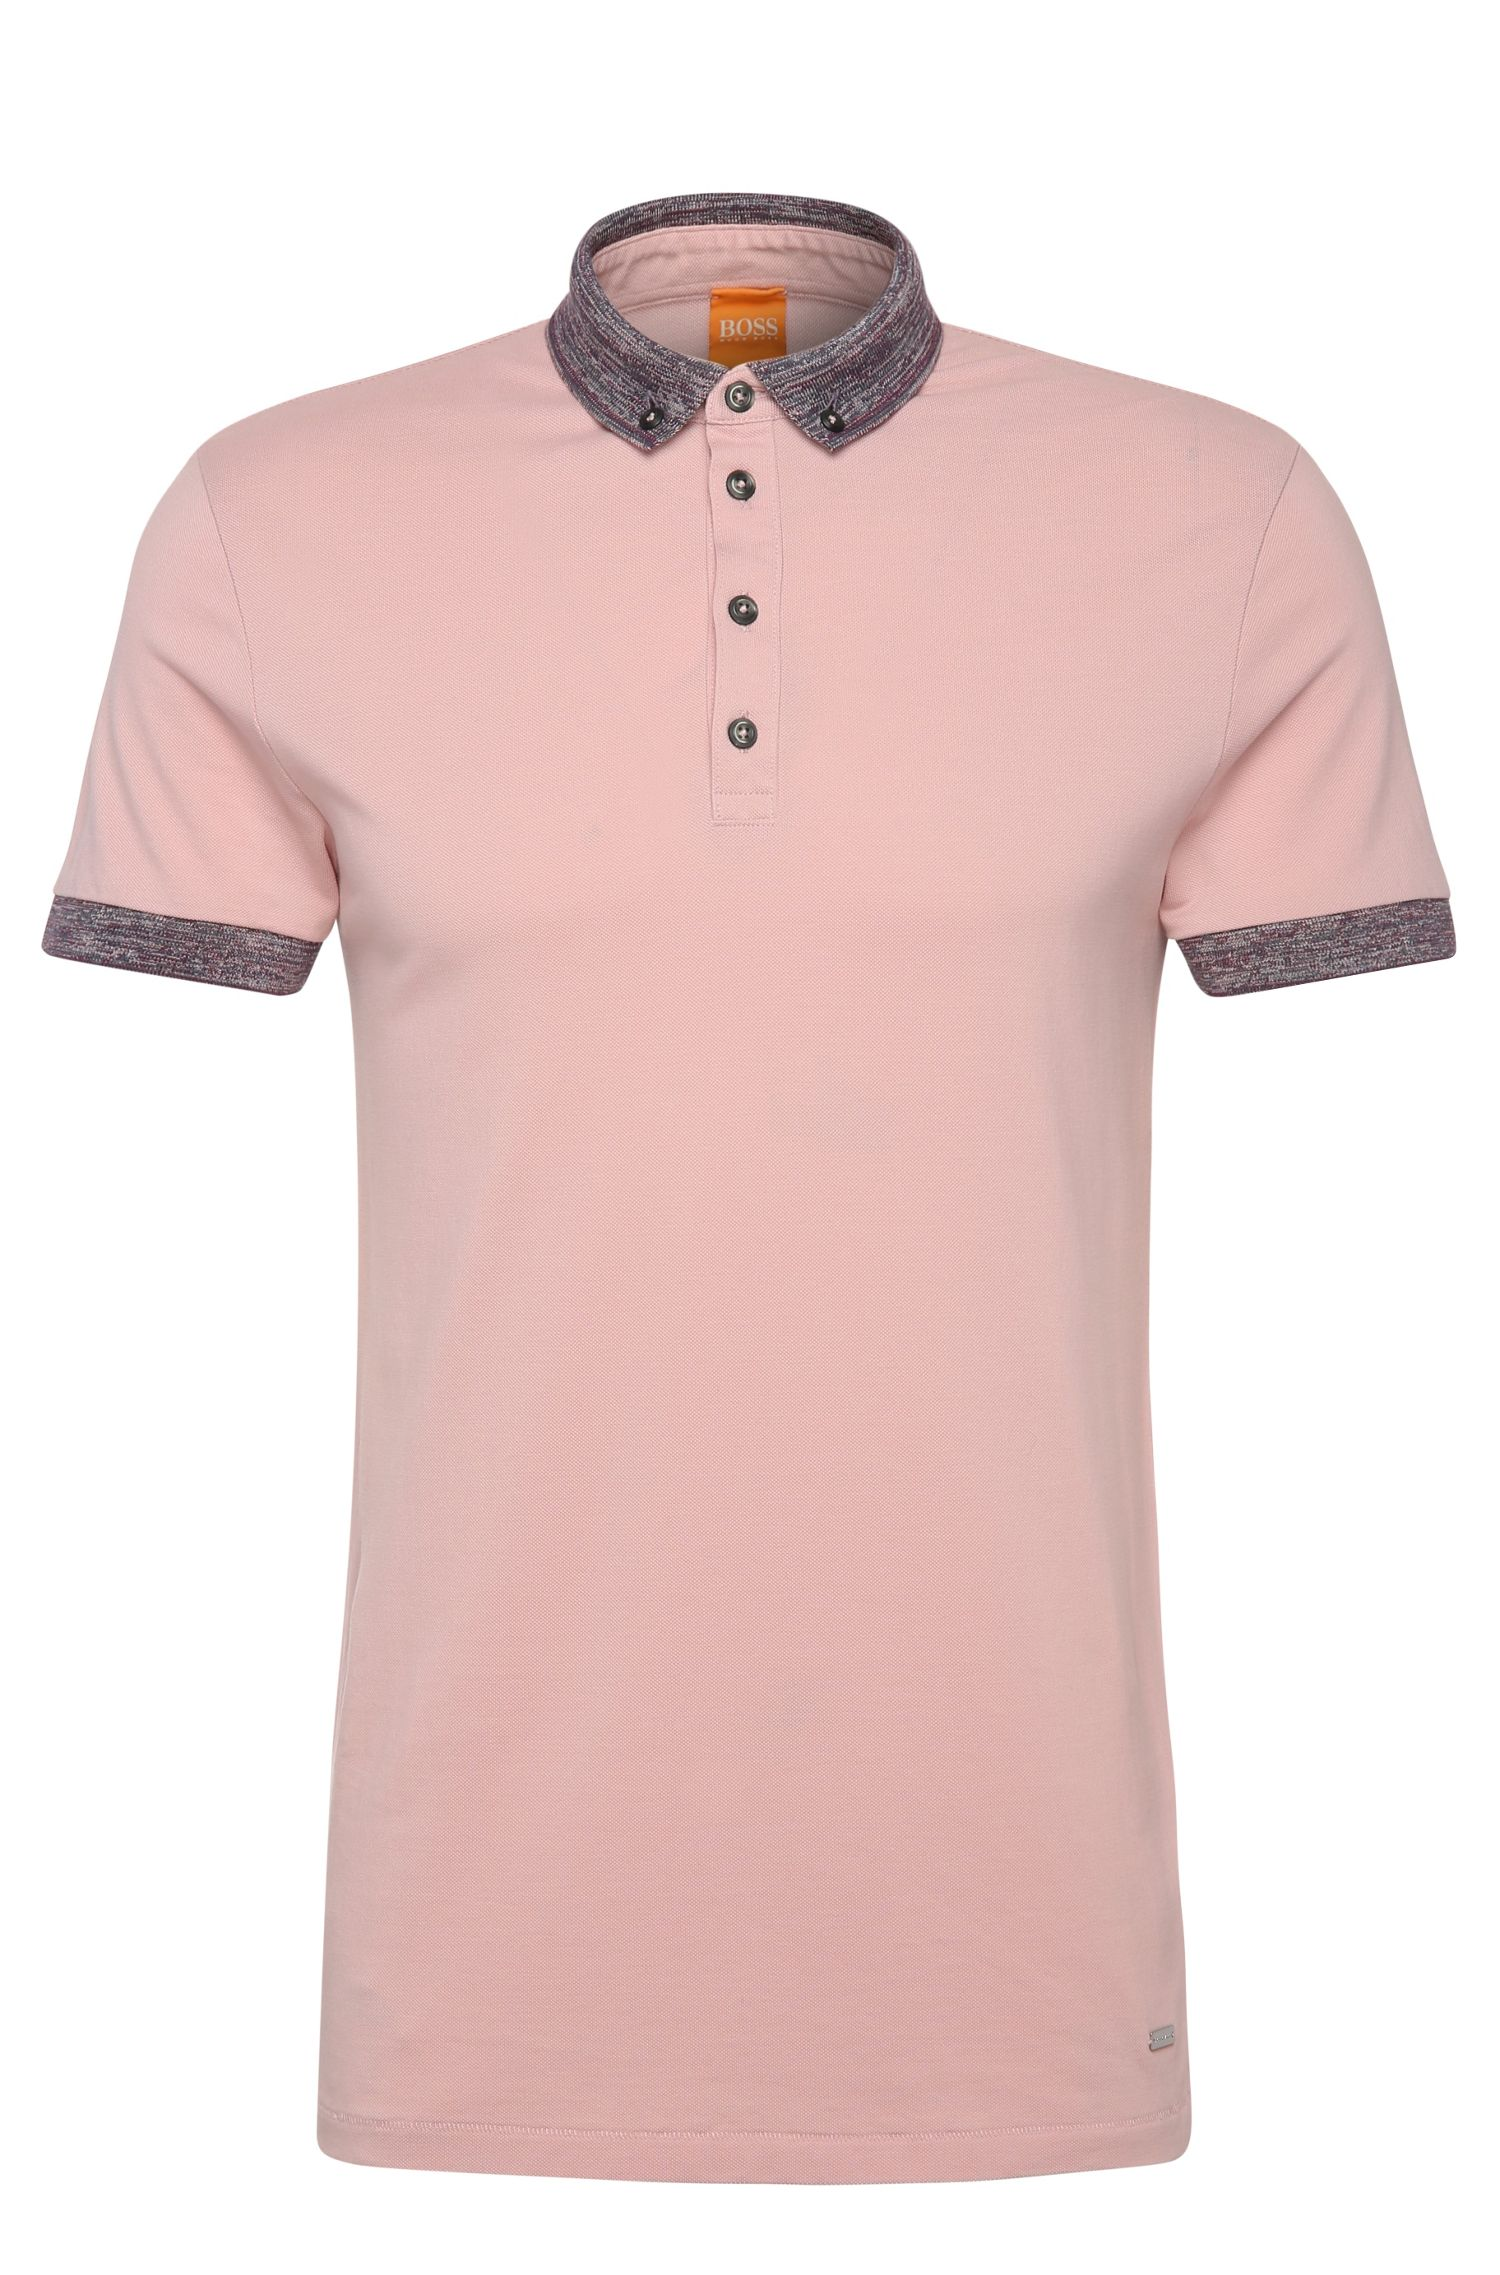 'Pilipe'   Slim Fit, Cotton Polo Shirt